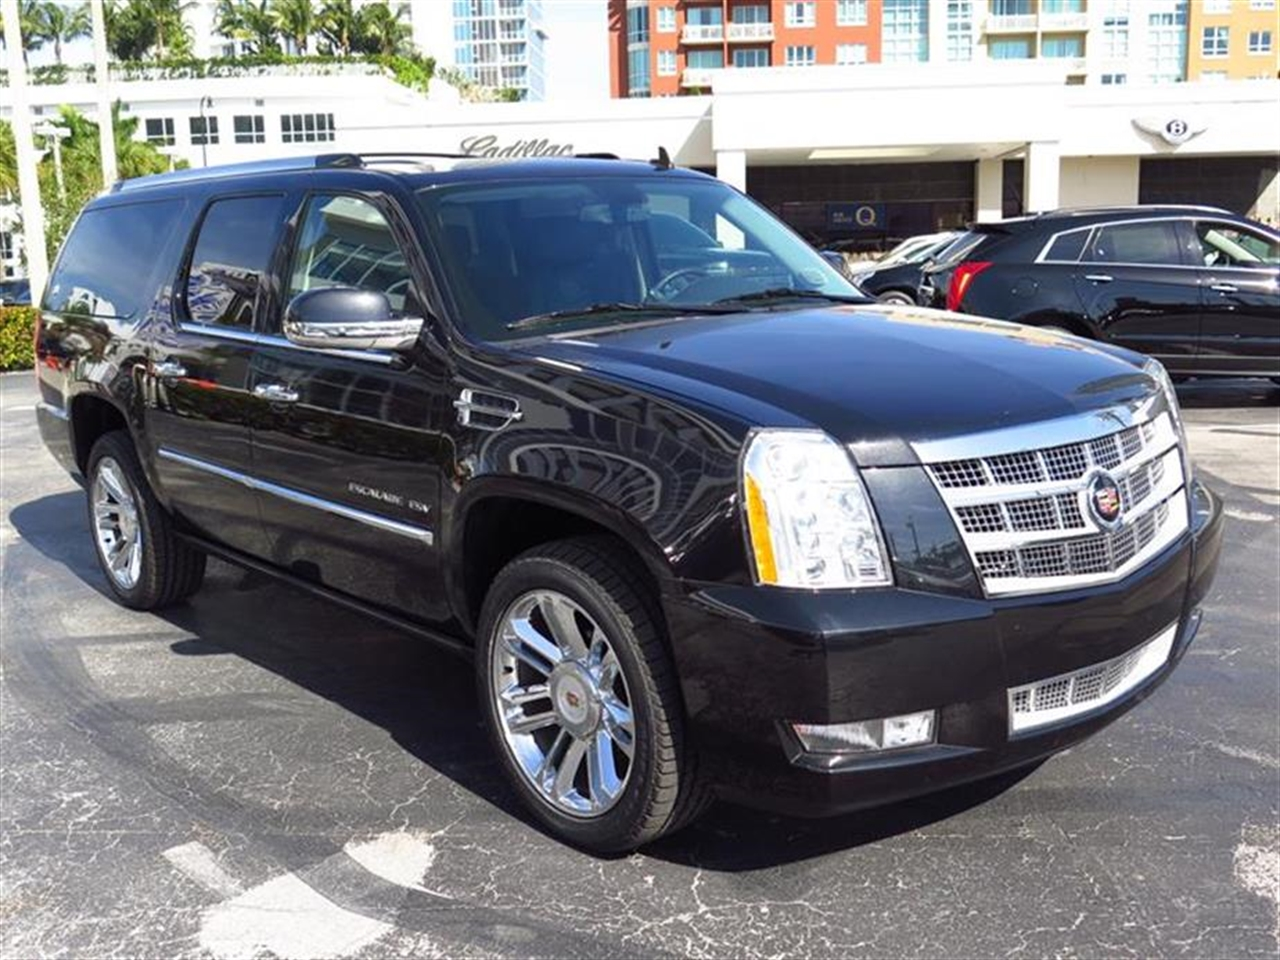 2013 CADILLAC ESCALADE ESV 2WD 4dr Platinum Edition 37183 miles VIN 1GYS3KEF6DR226838